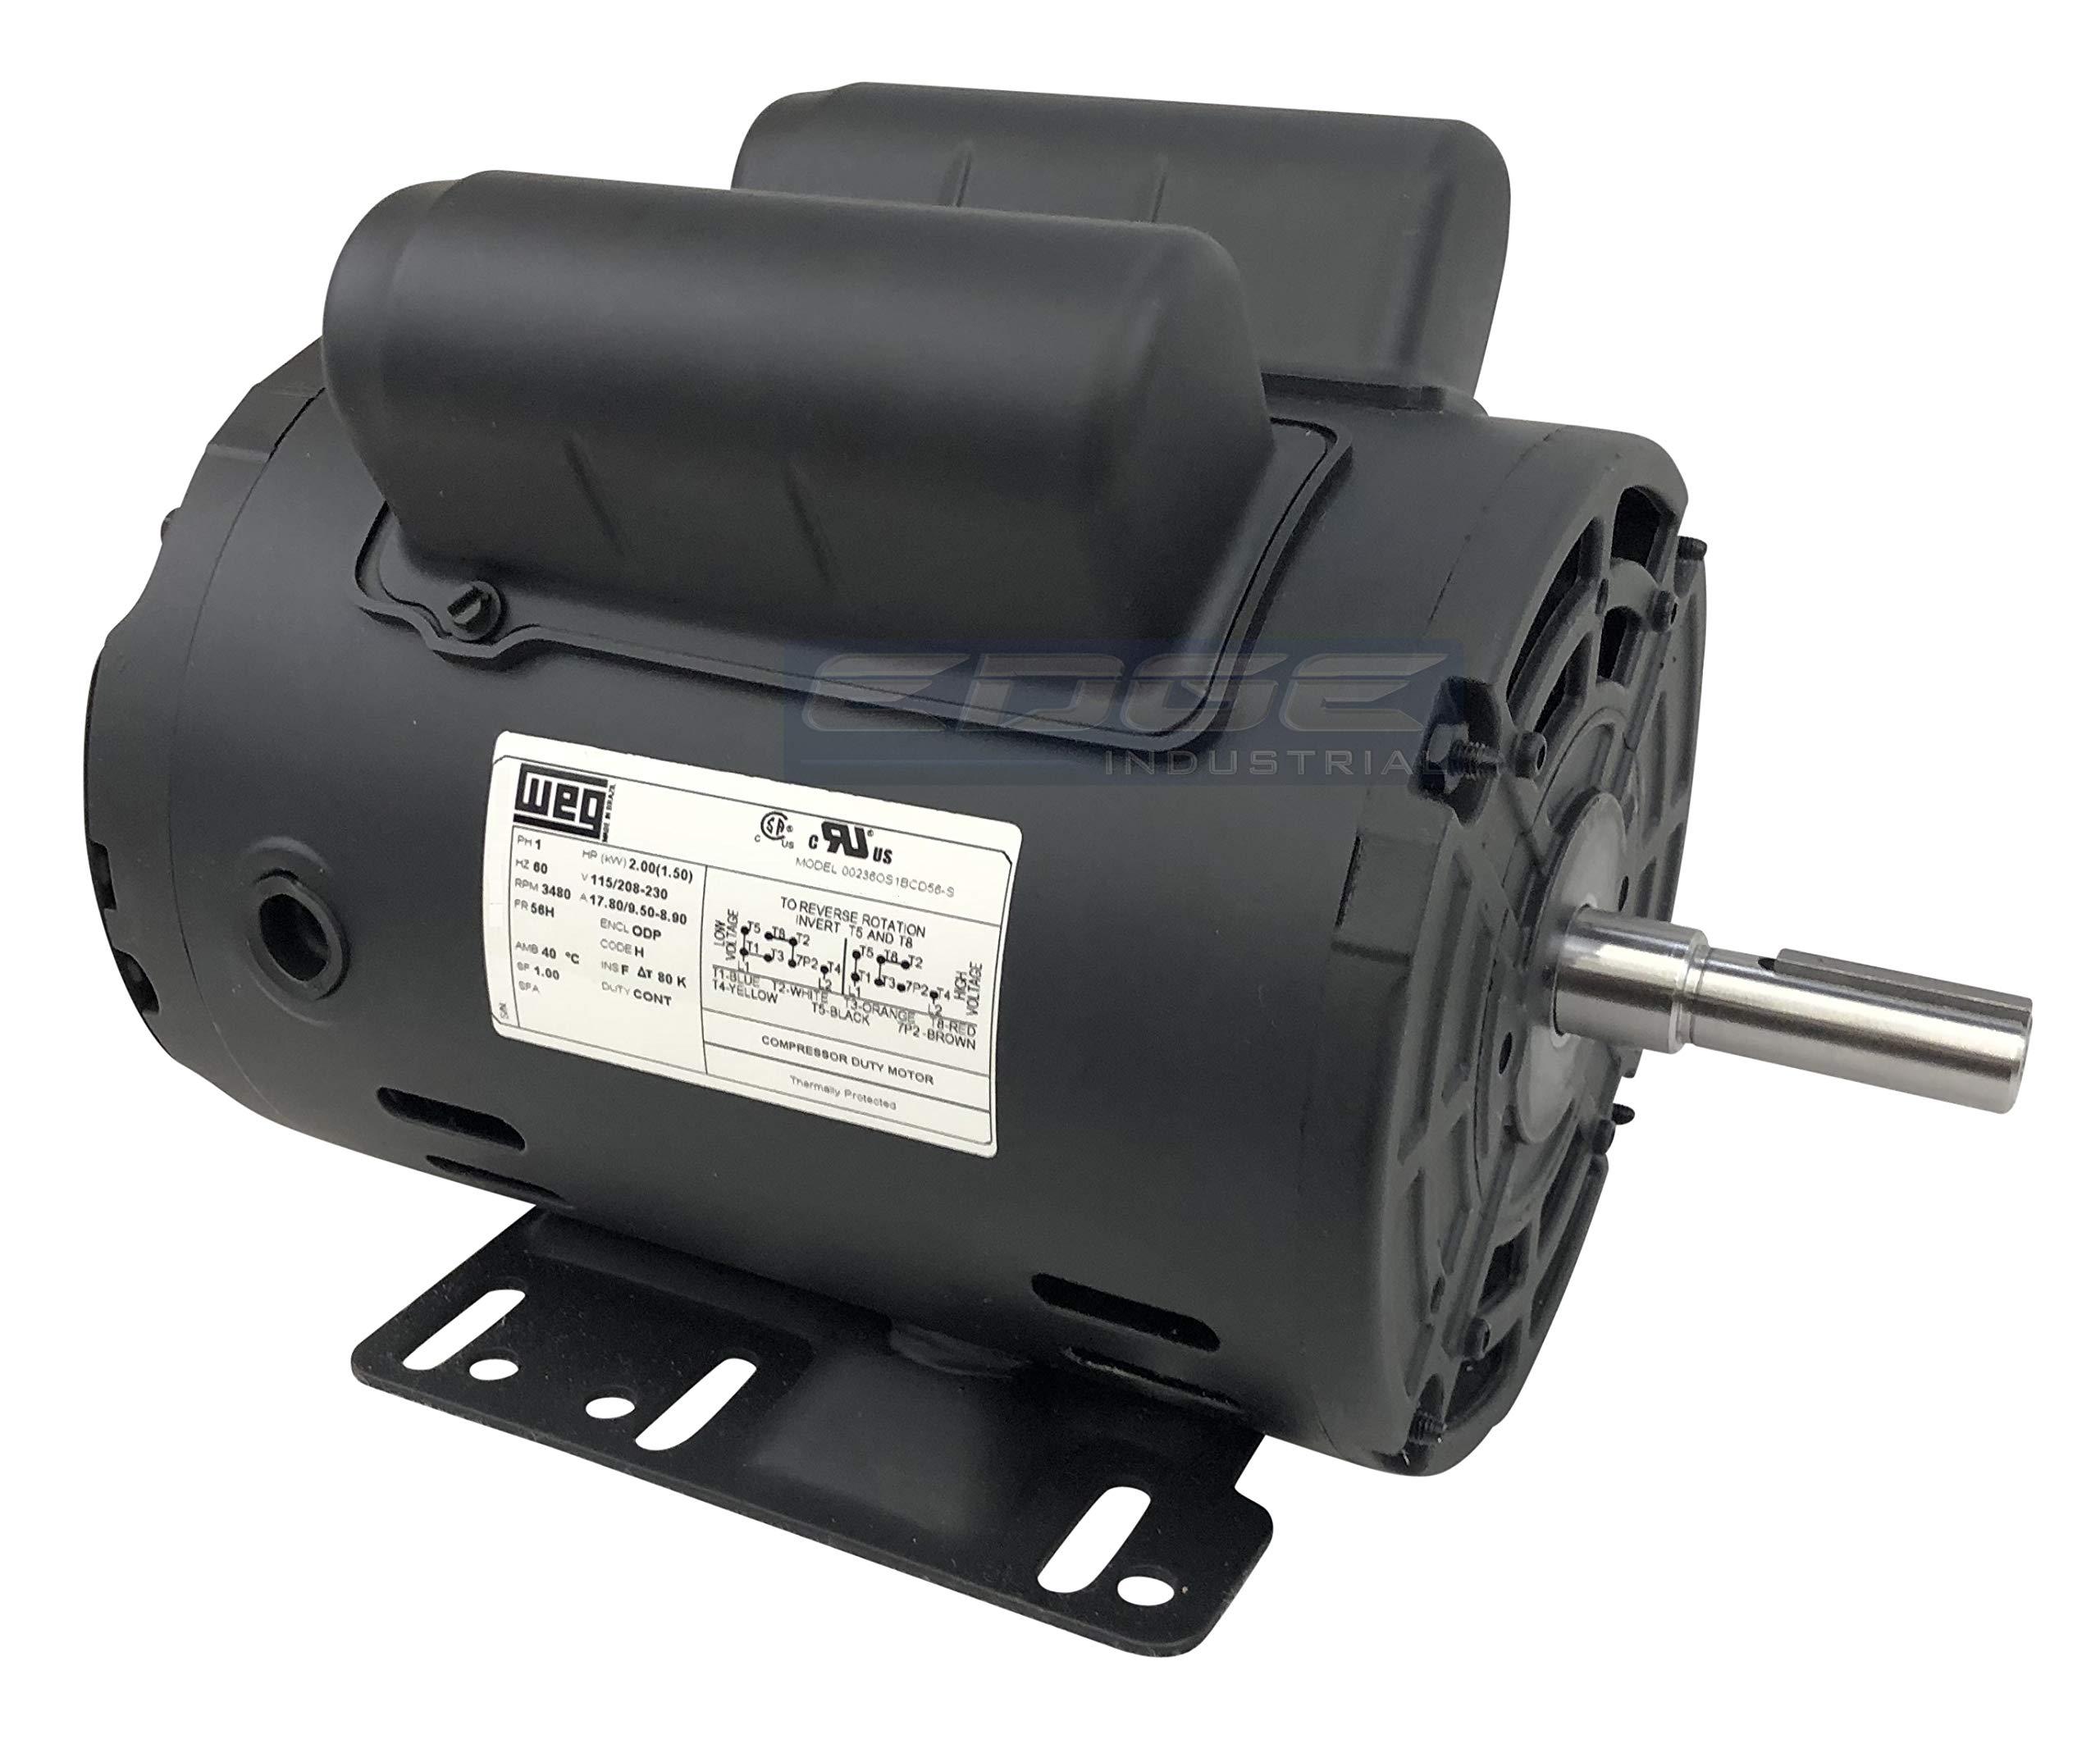 WEG 00236OS1BCDD56 ODP Compressor Duty Definite Purpose Electric Motor, 2 HP, Single-Phase, 3440 RPM, 115/208-230 V, 60 Hz, Frame D56